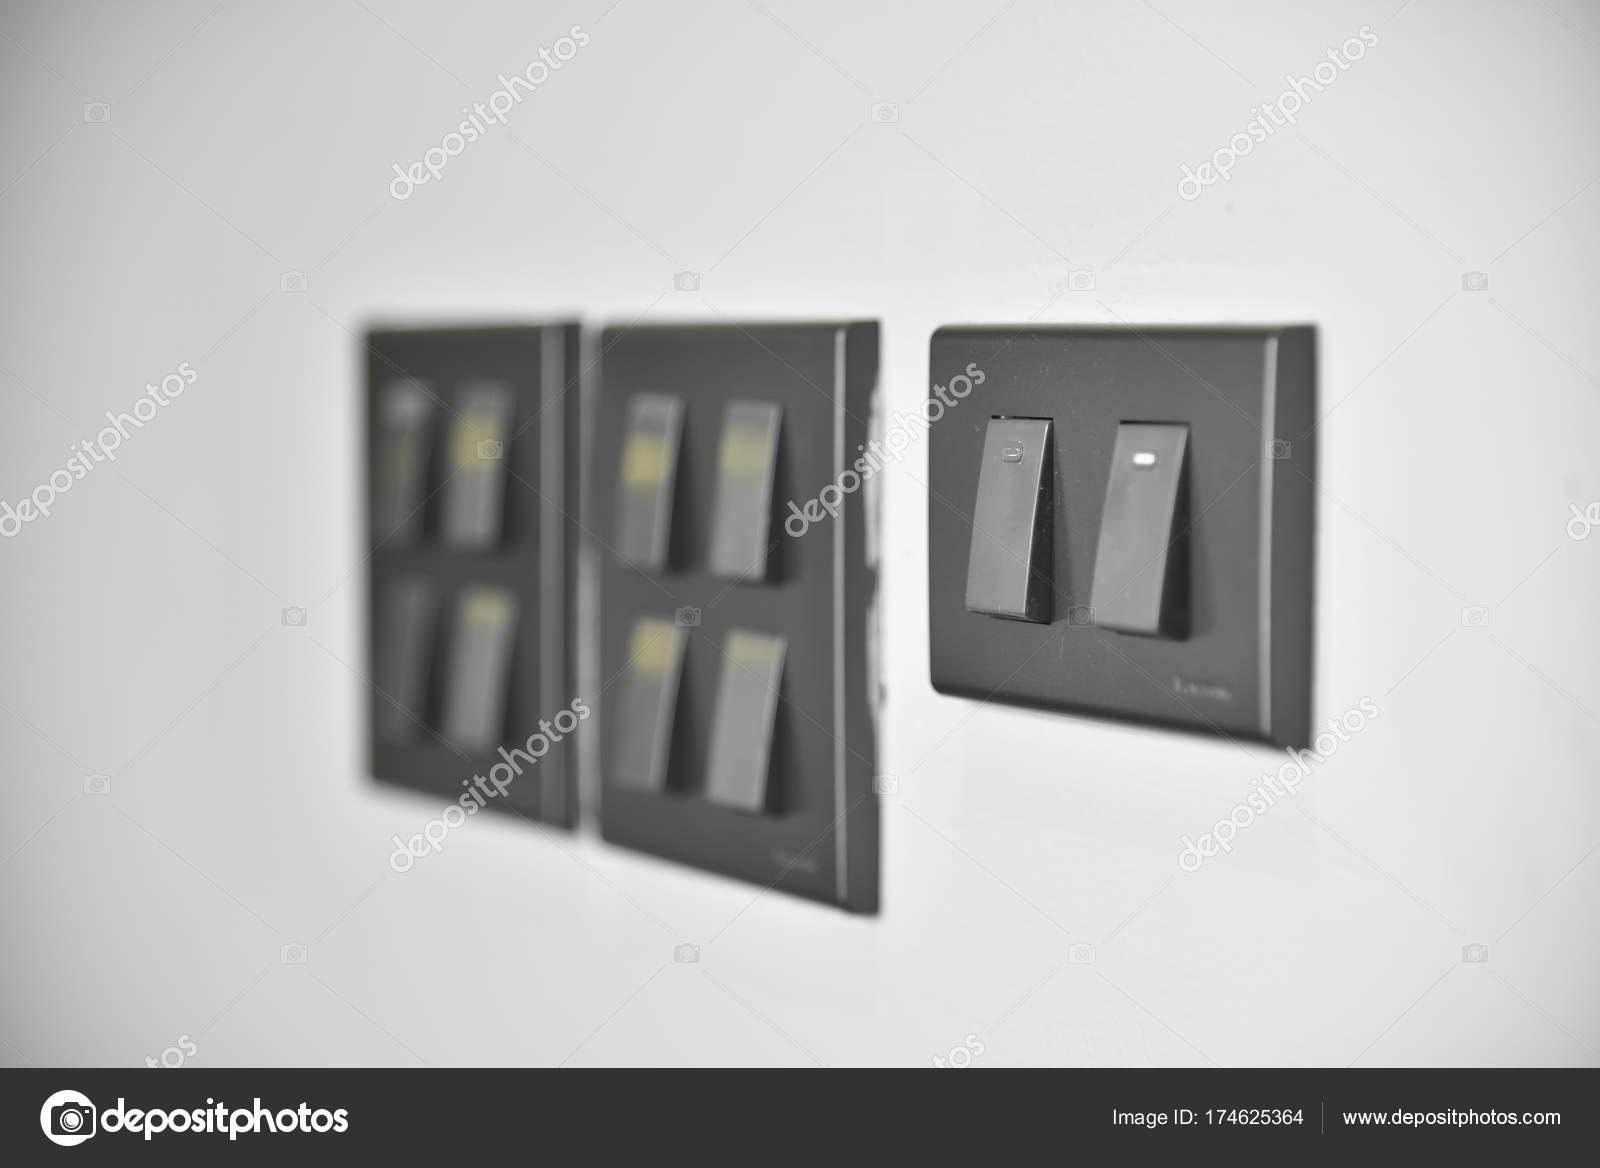 lighting switches on wall. — Stock Photo © eggeeggjiew #174625364